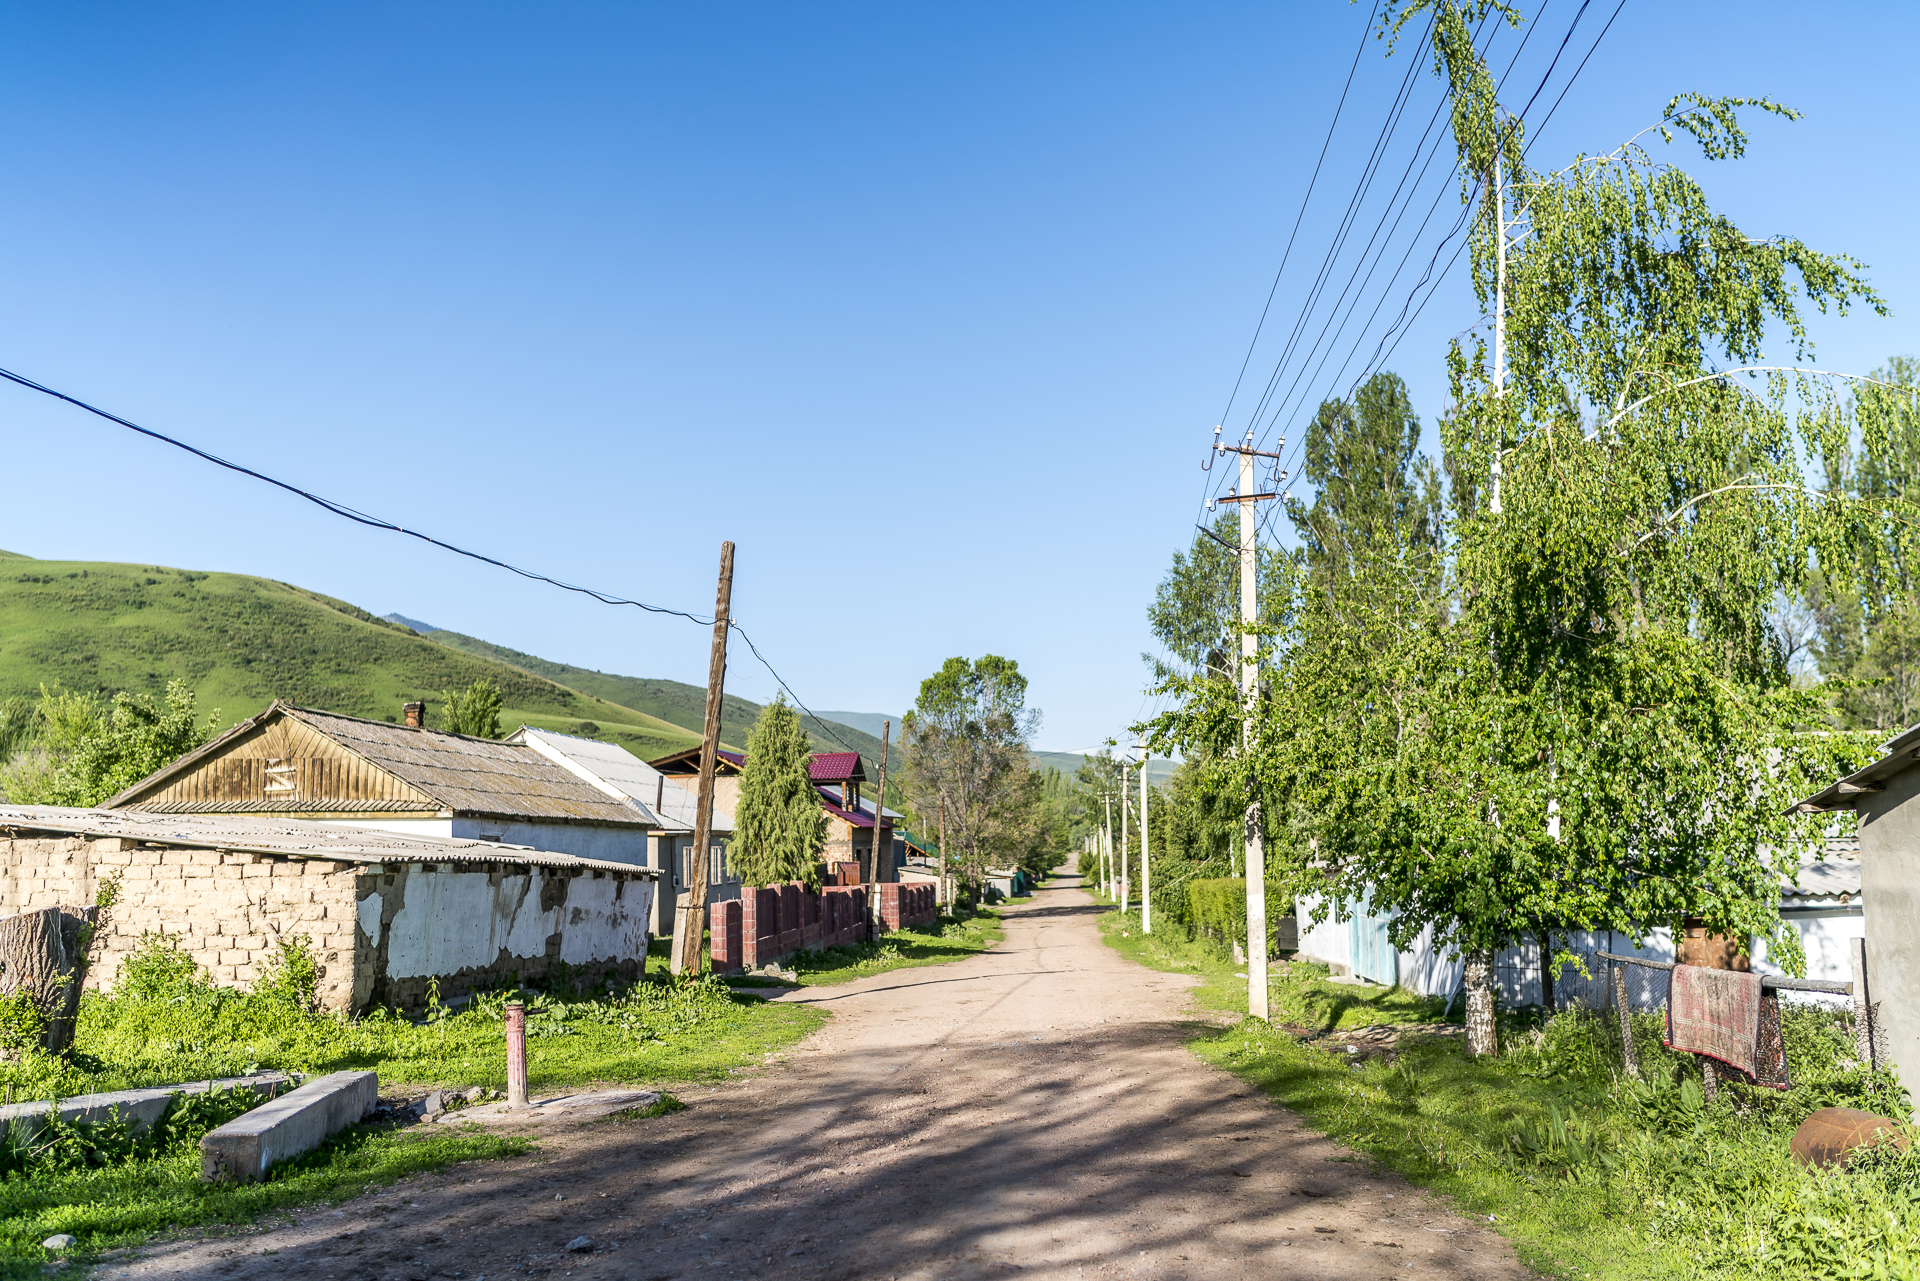 Dorfleben in Kirgistan